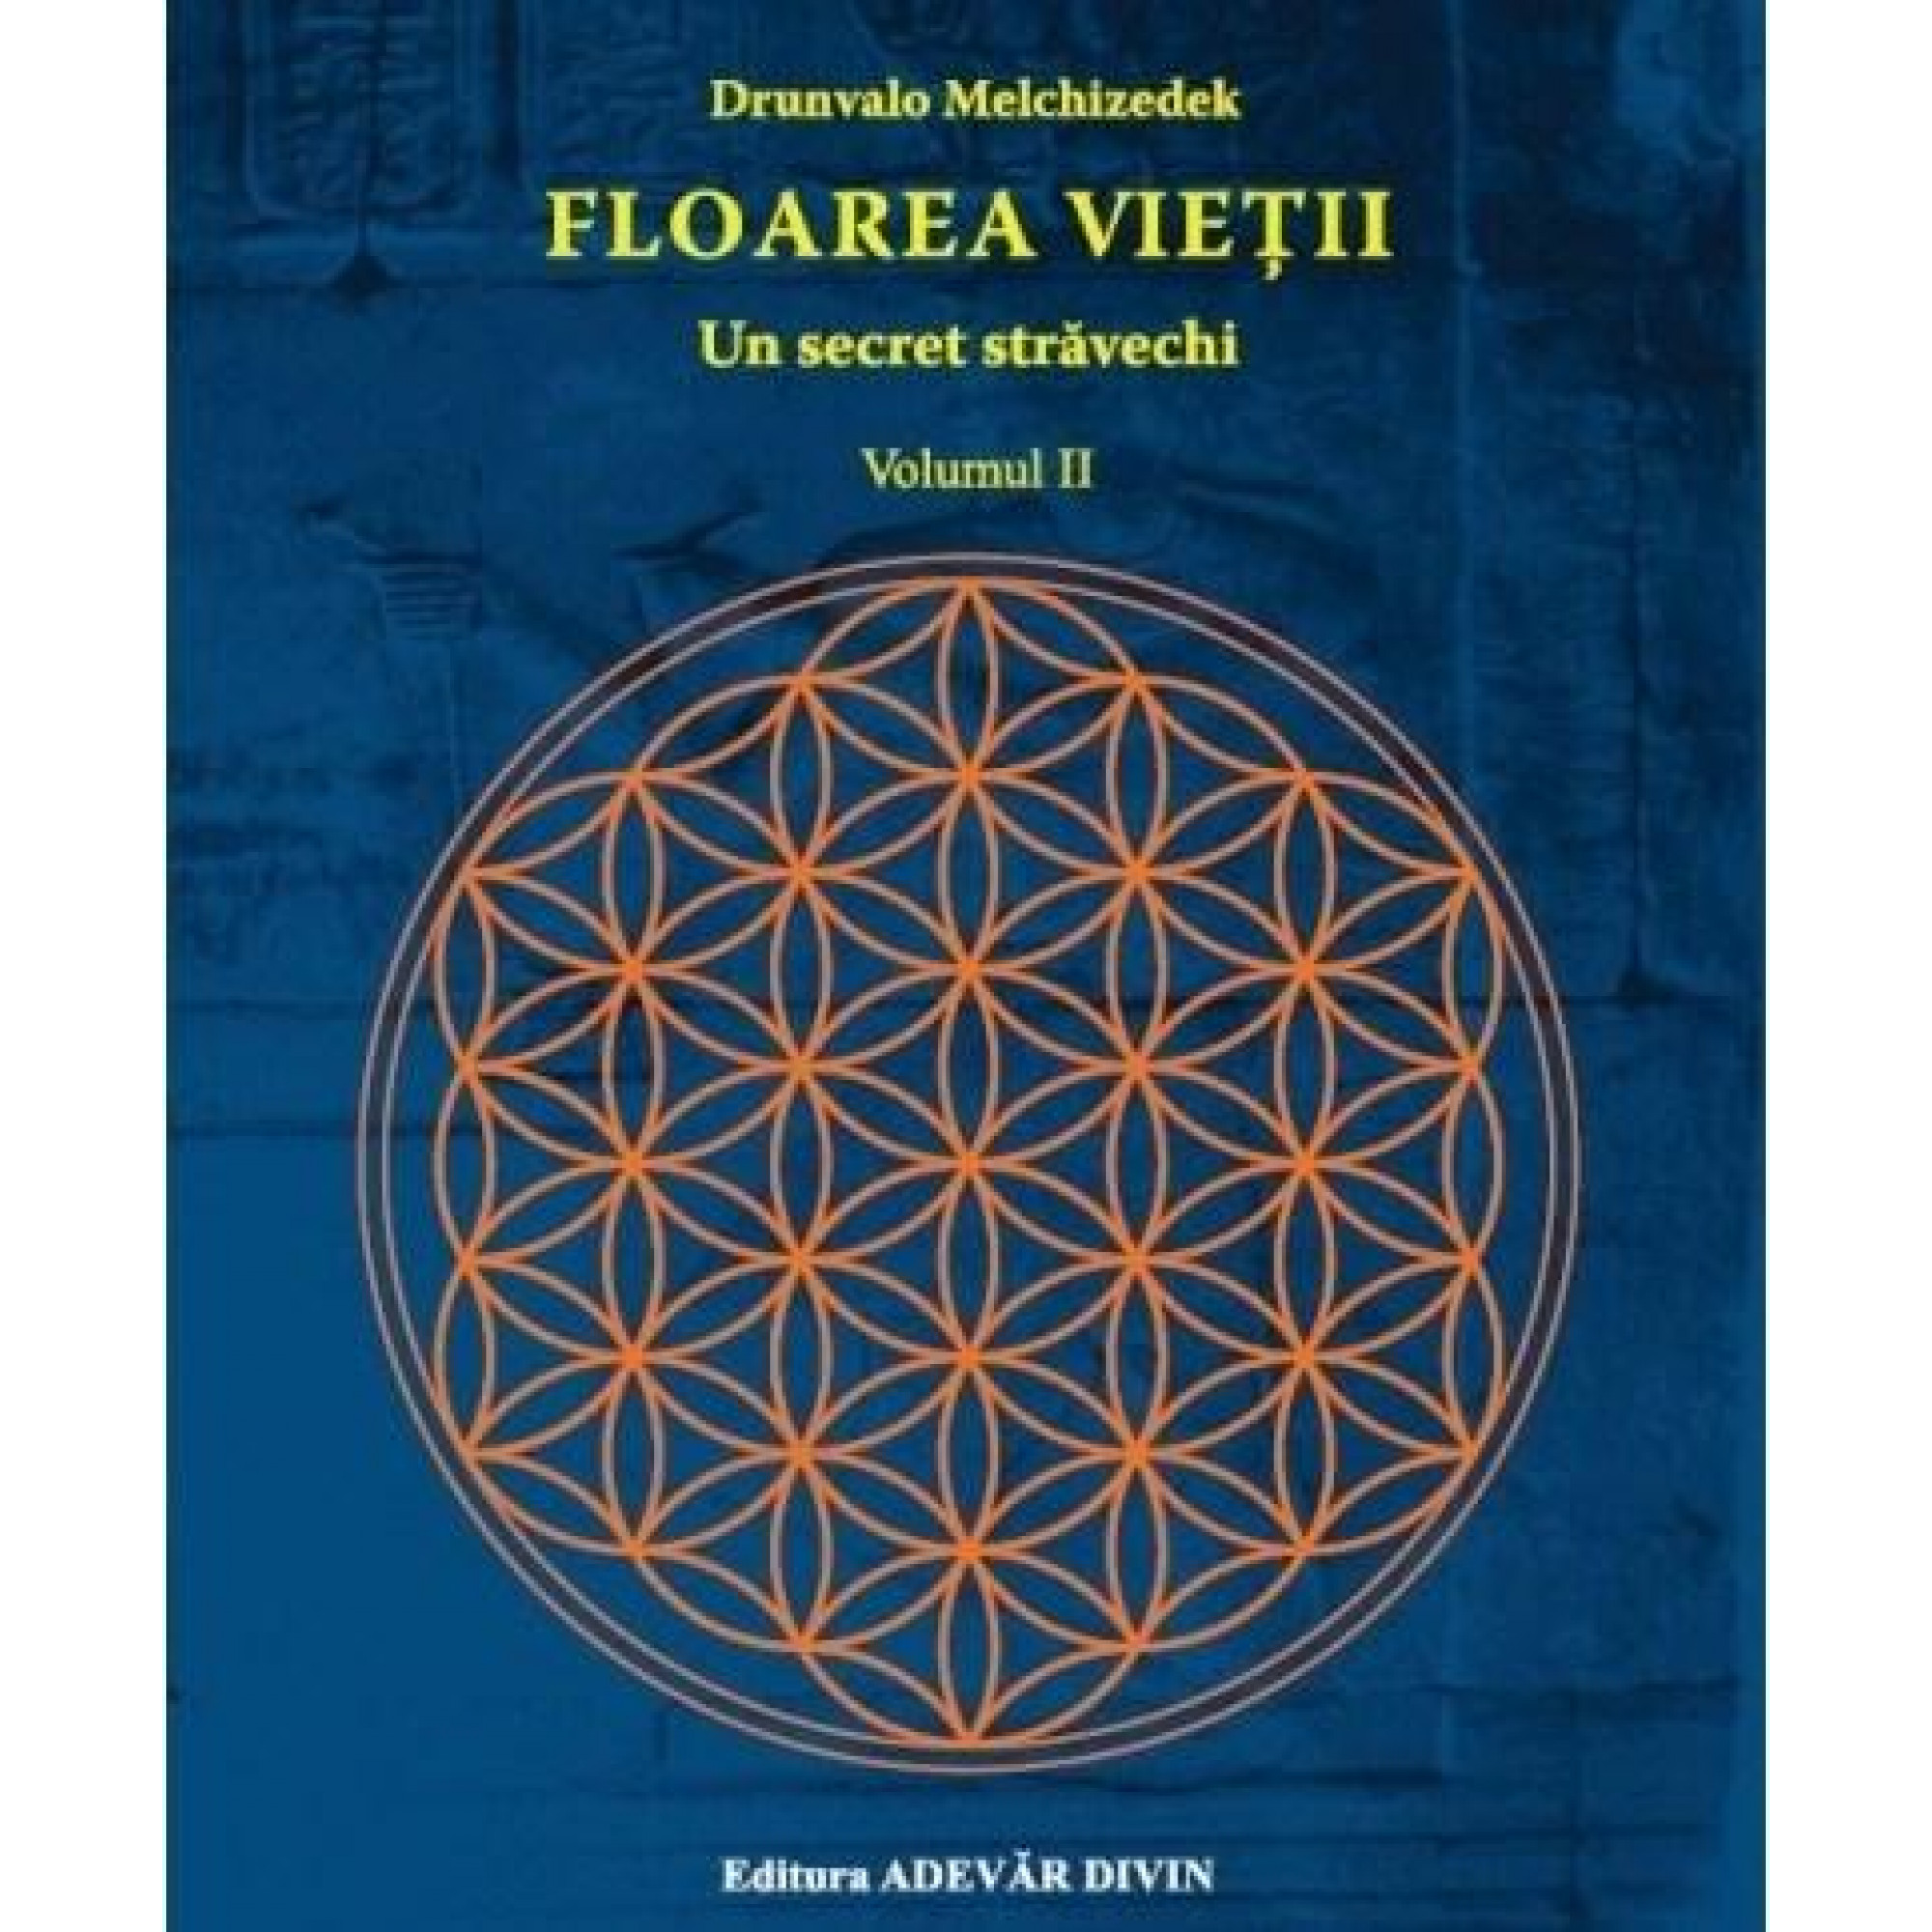 Floarea vieții. Volumul II; Drunvalo Melchizedek